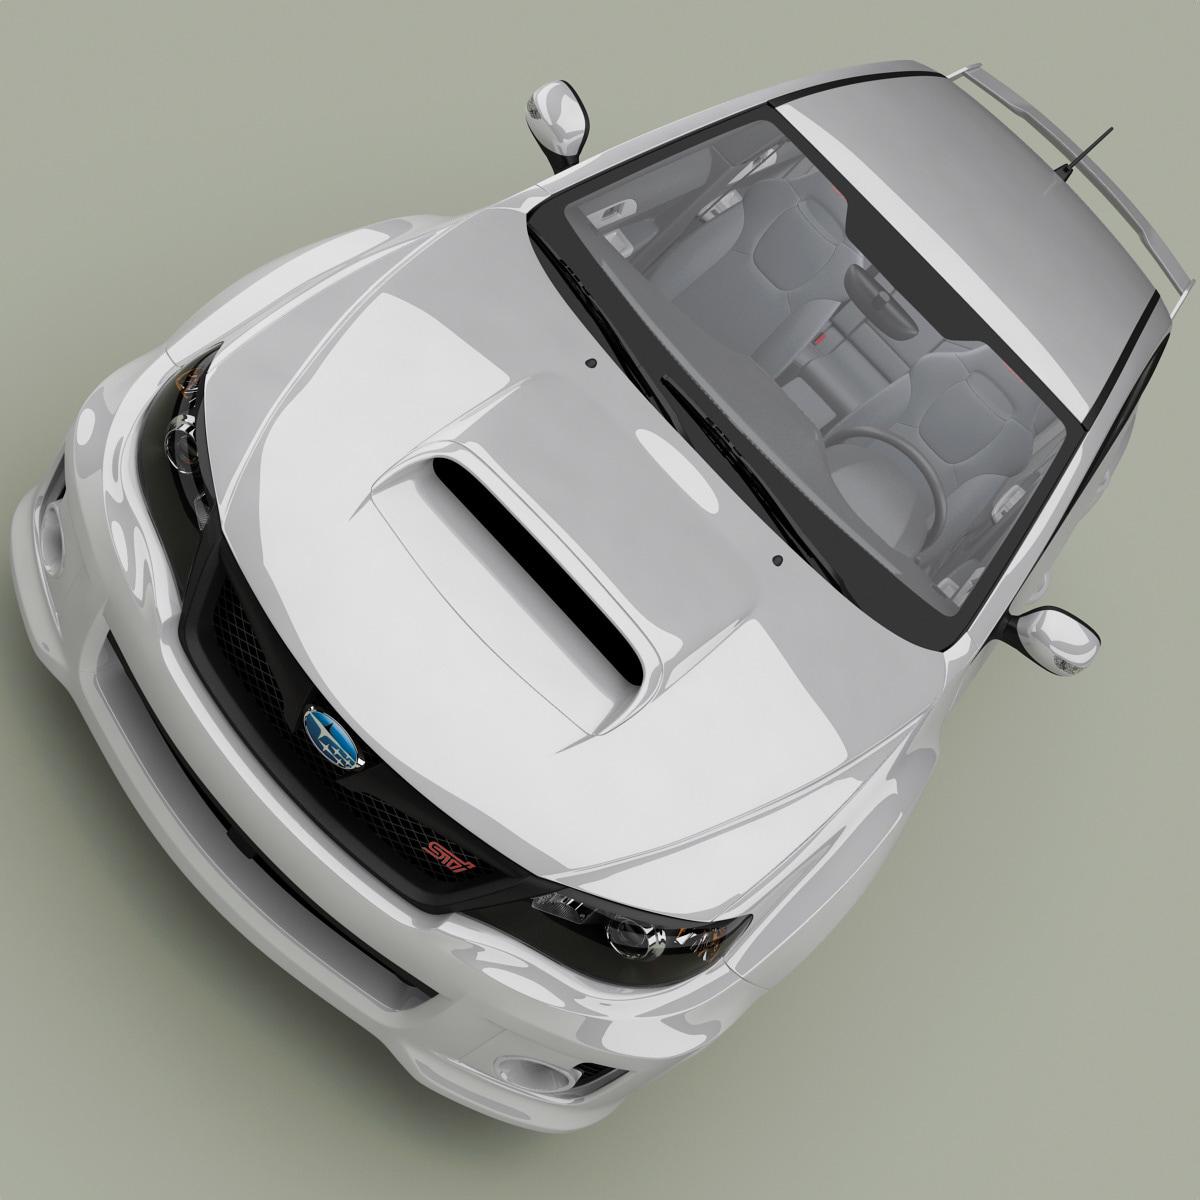 Subaru_Impreza_WRX_STI_001.jpg